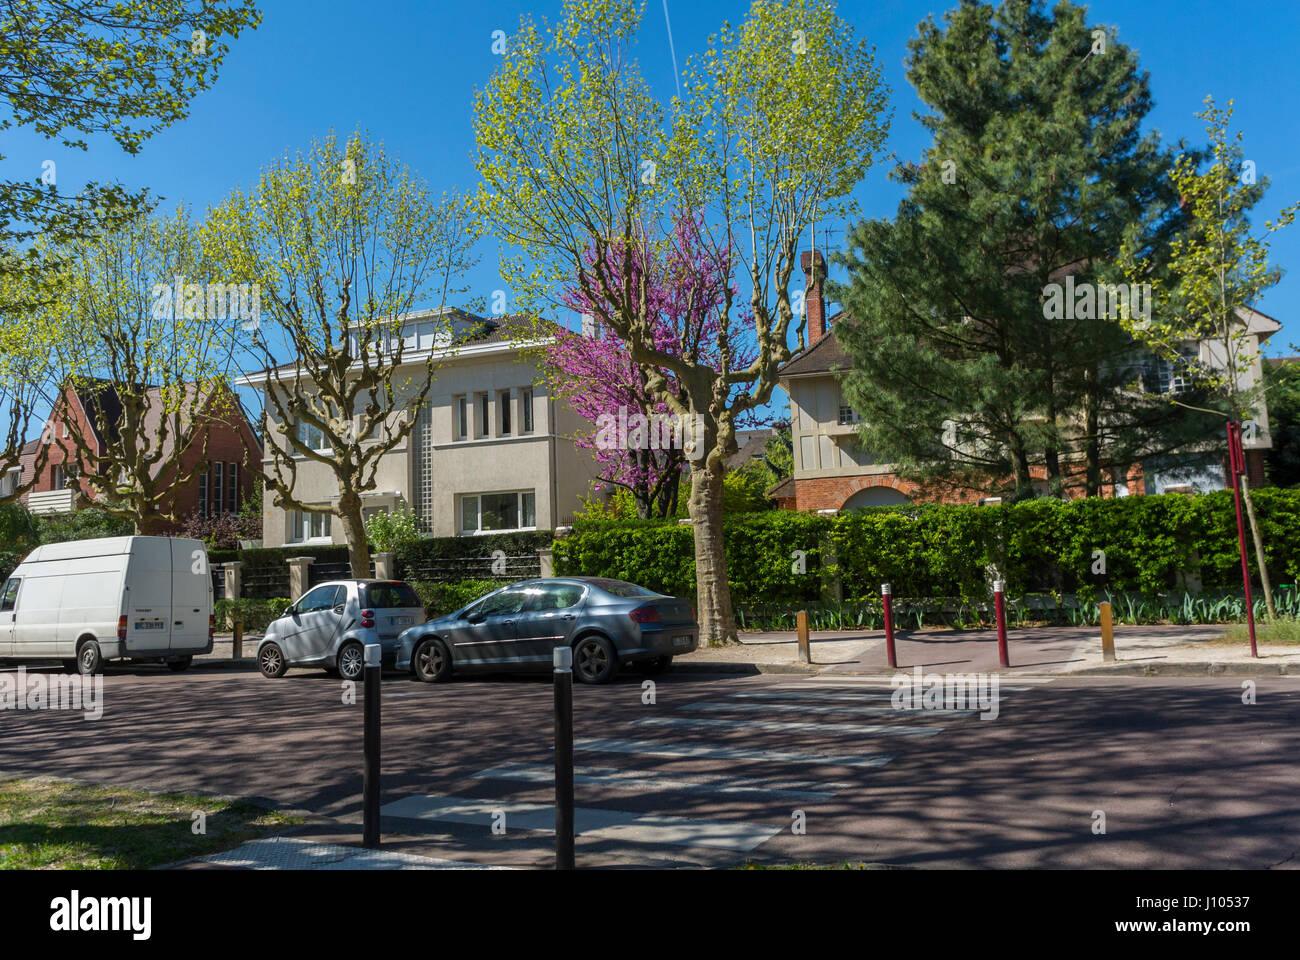 Antony, France, Paris Suburbs, Street Scenes, Single Family Houses, Local neighbourhoods - Stock Image